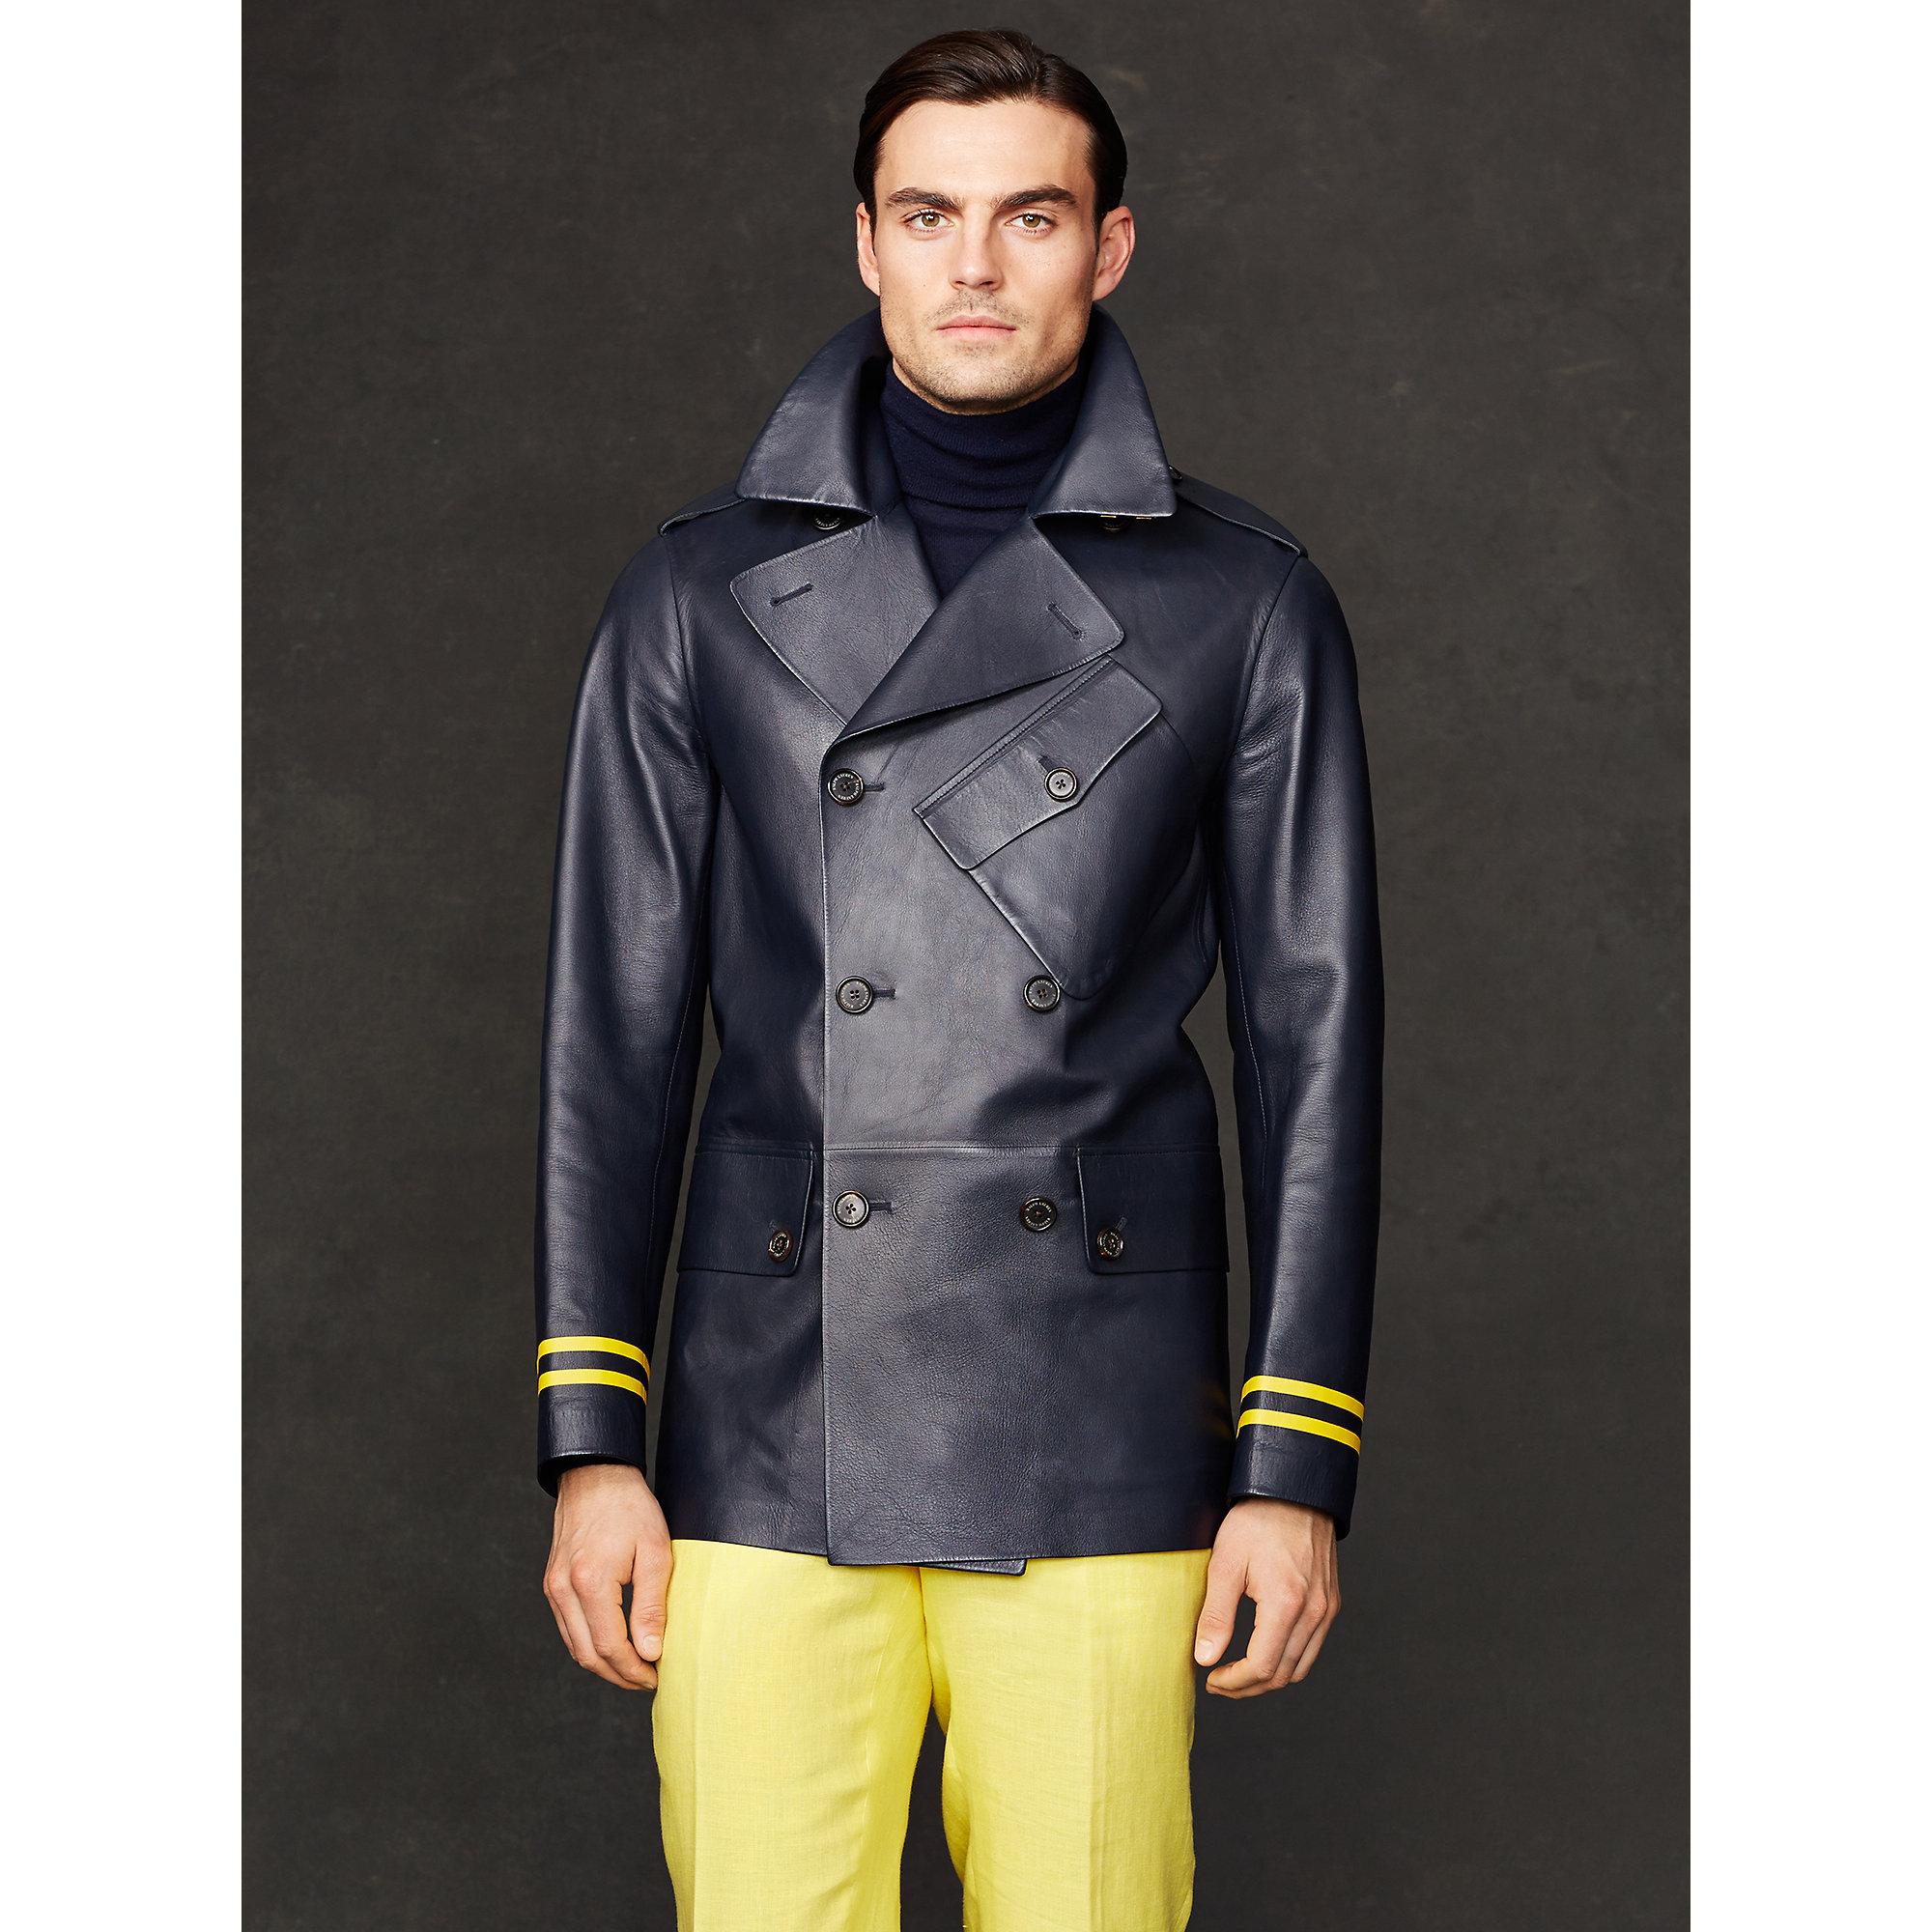 Ralph lauren purple label Leather Bridgewater Pea Coat in Blue for ...